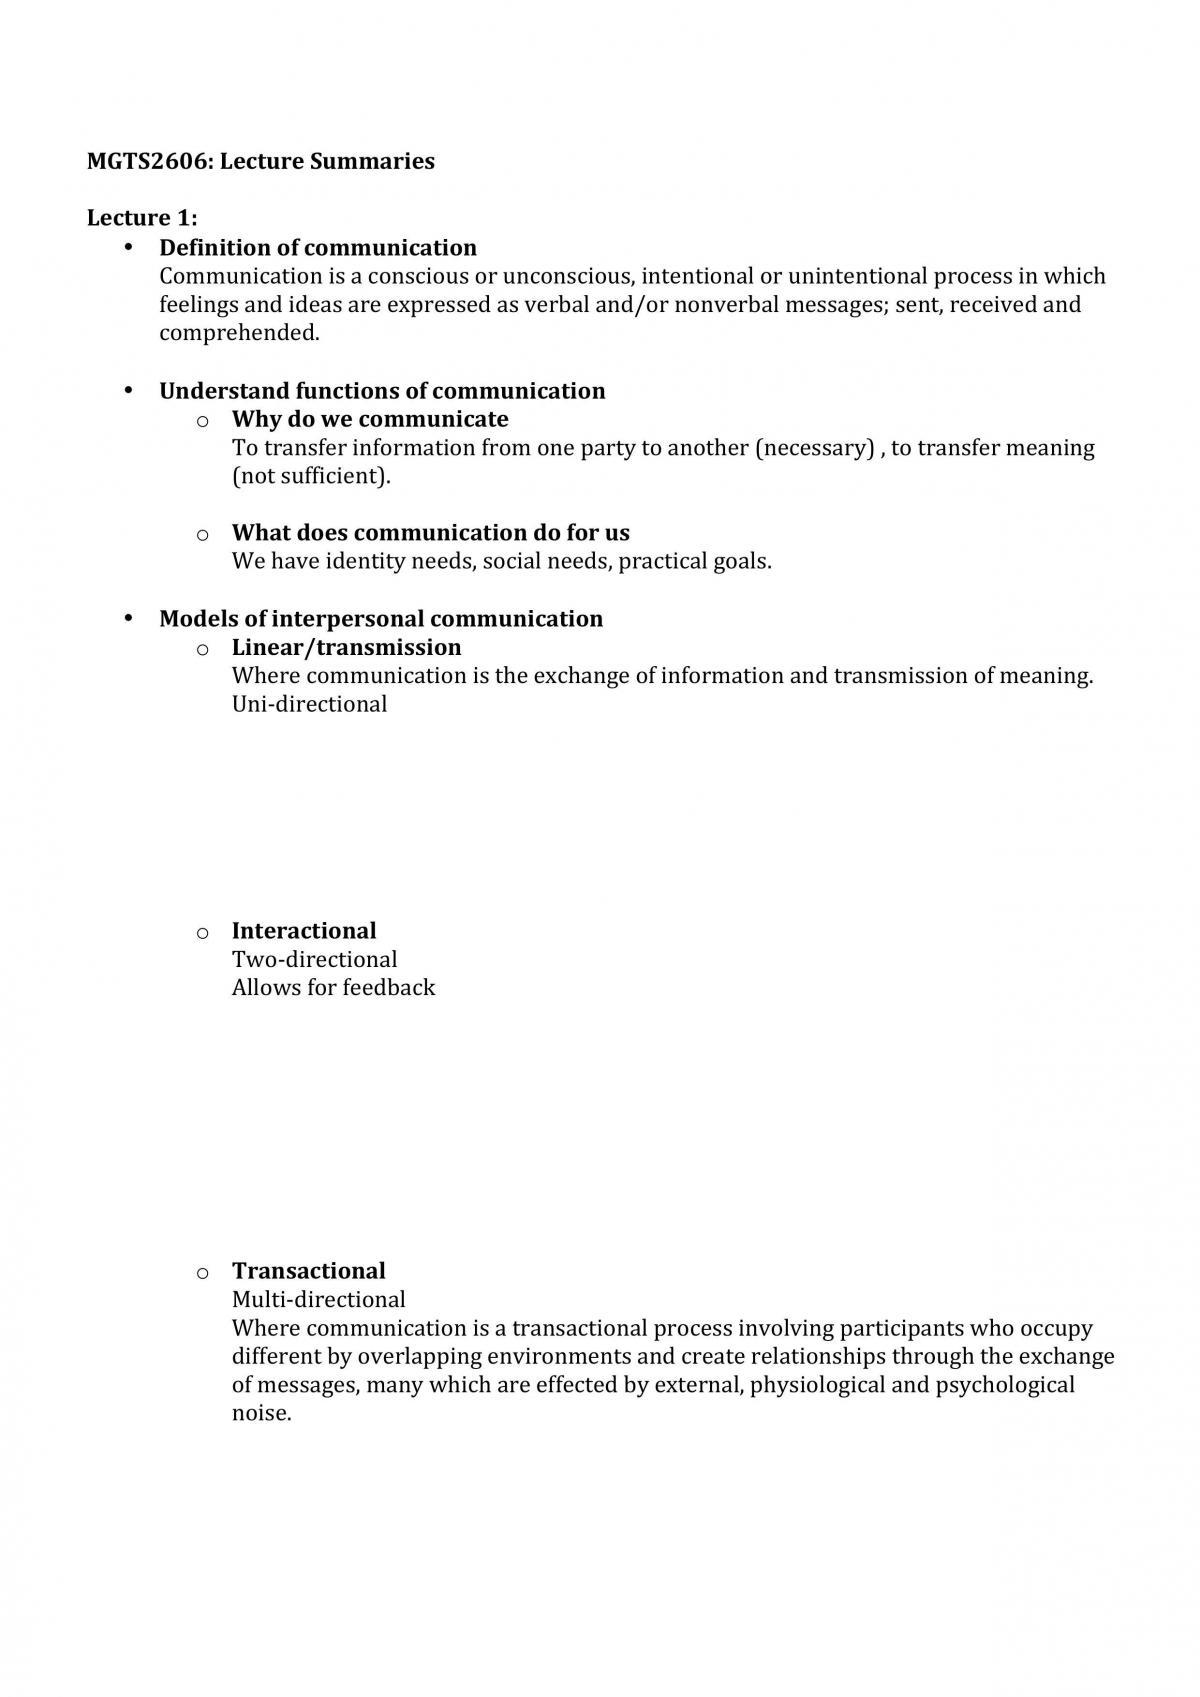 MGTS2606 Final Exam Notes - Page 1